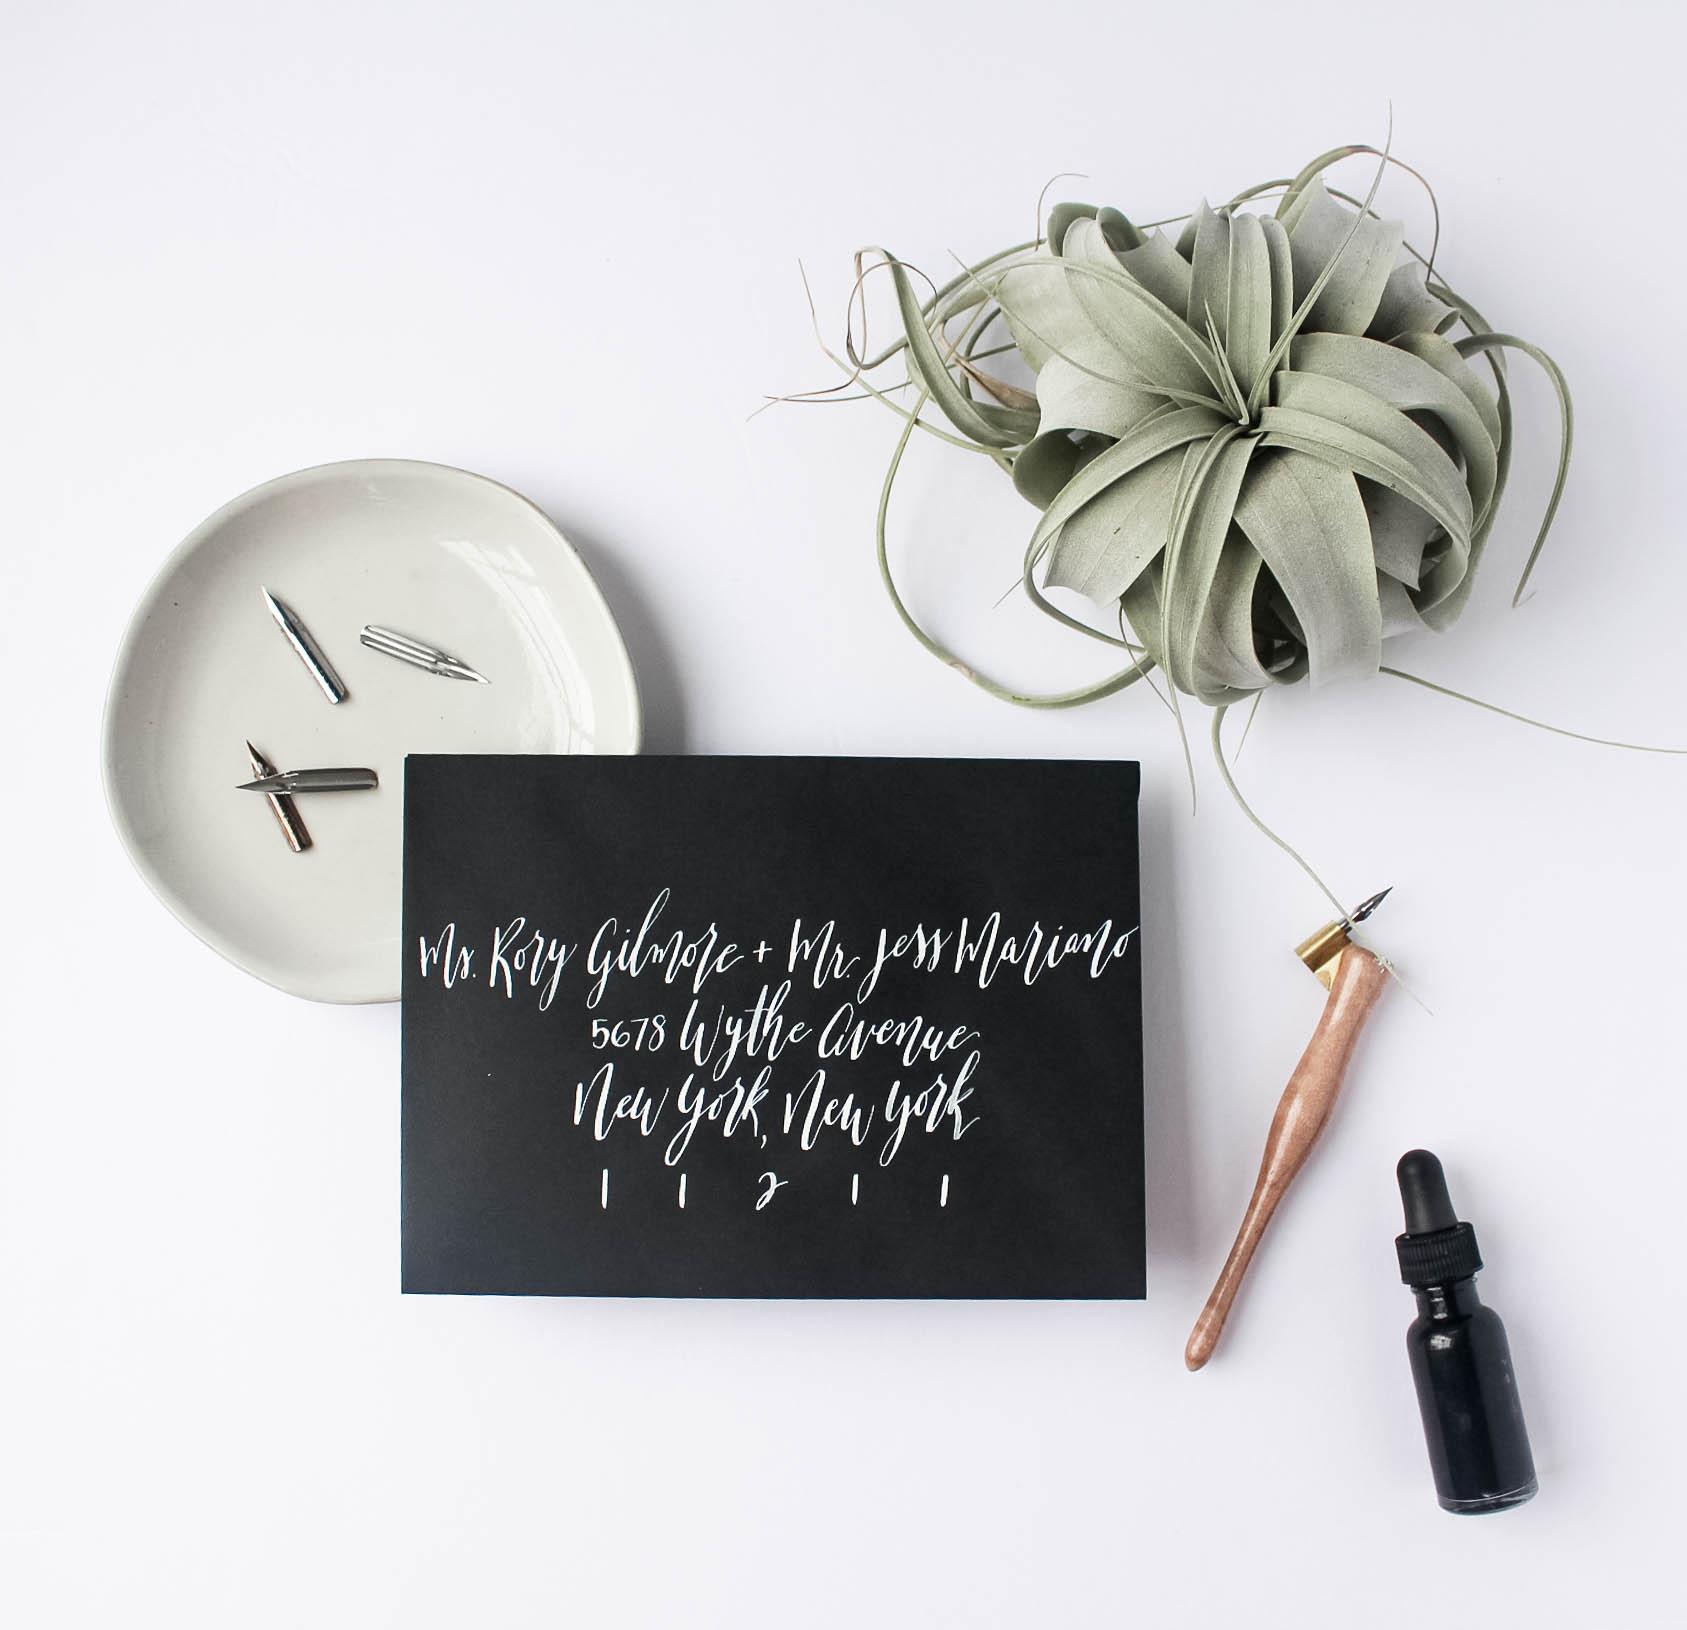 Wedding Envelope Addressing Etiquette - Black Envelope with White Ink - True North Paper Co.